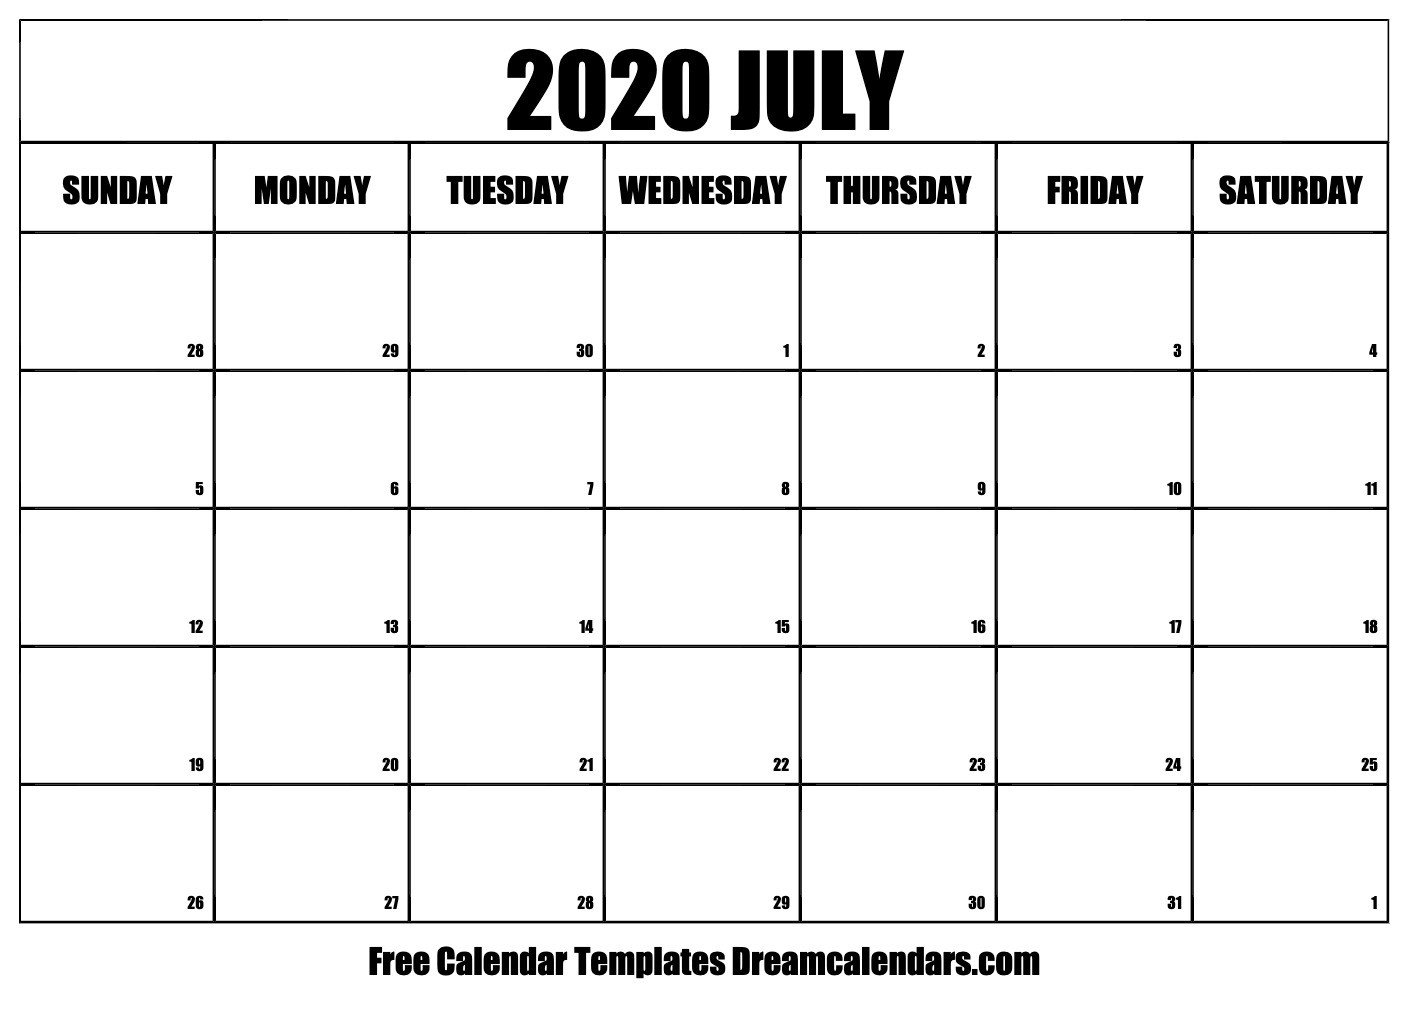 2020 Free Monthly Printable Calendar Monday Thru Friday Free Printable Calendar Monday To Friday